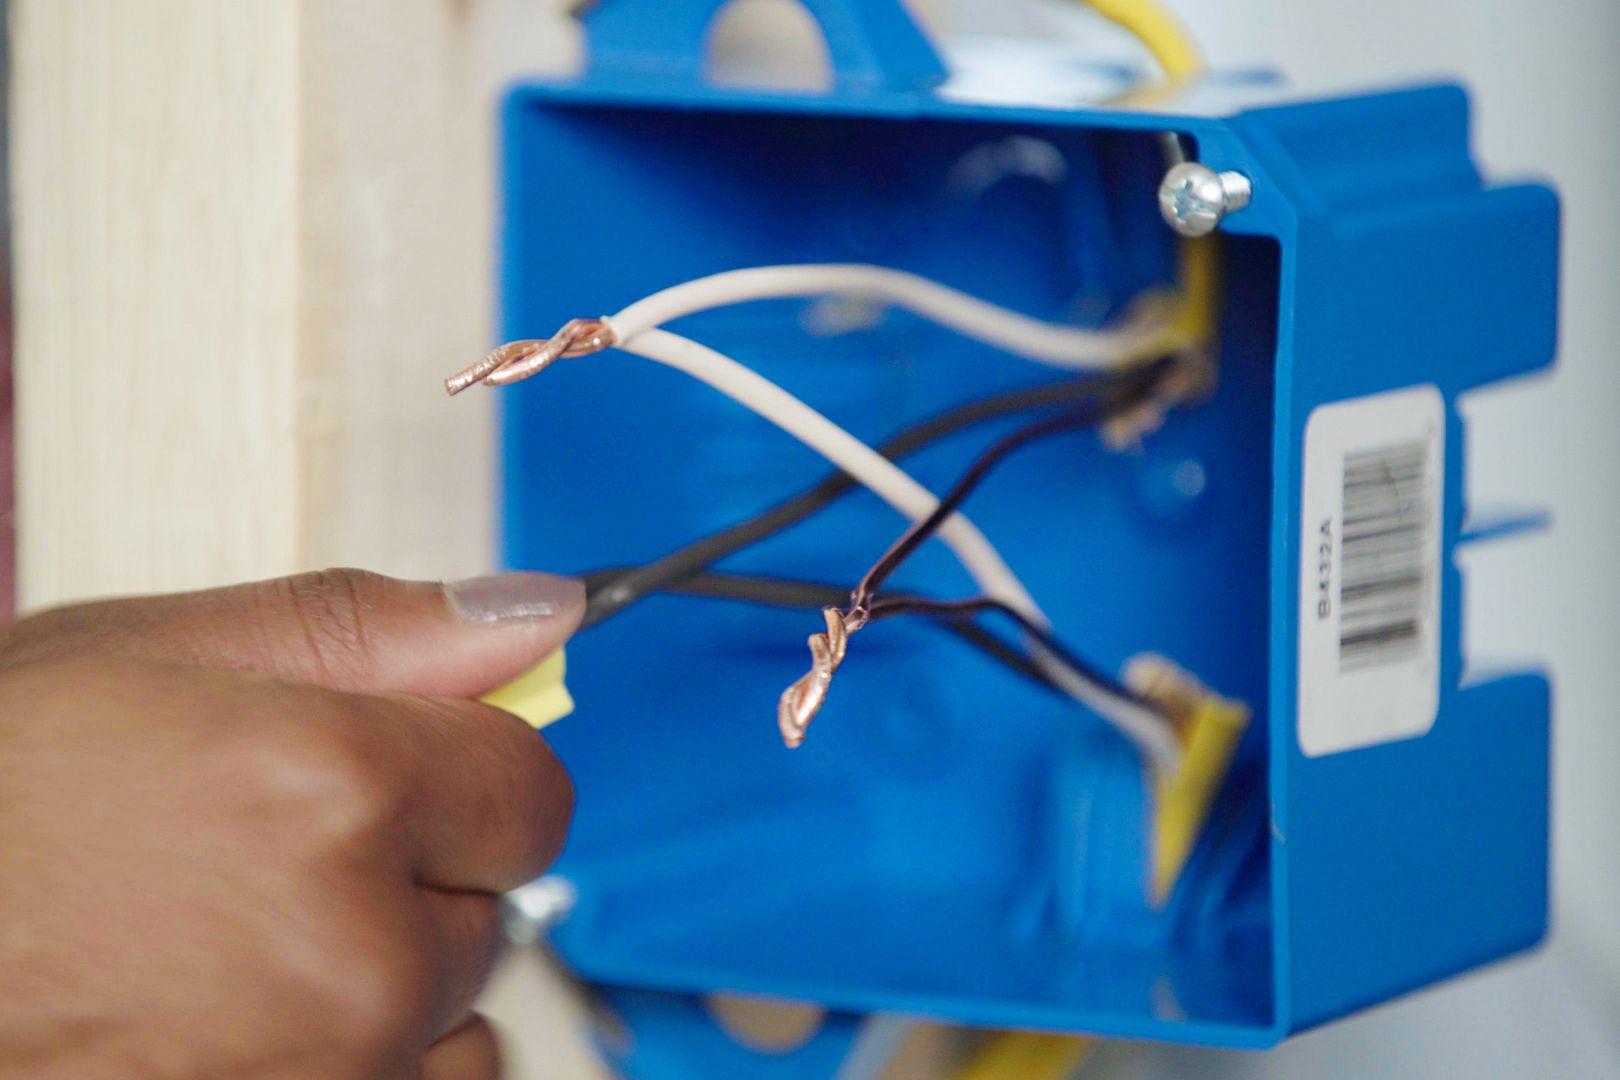 Installing a Proper Junction Box